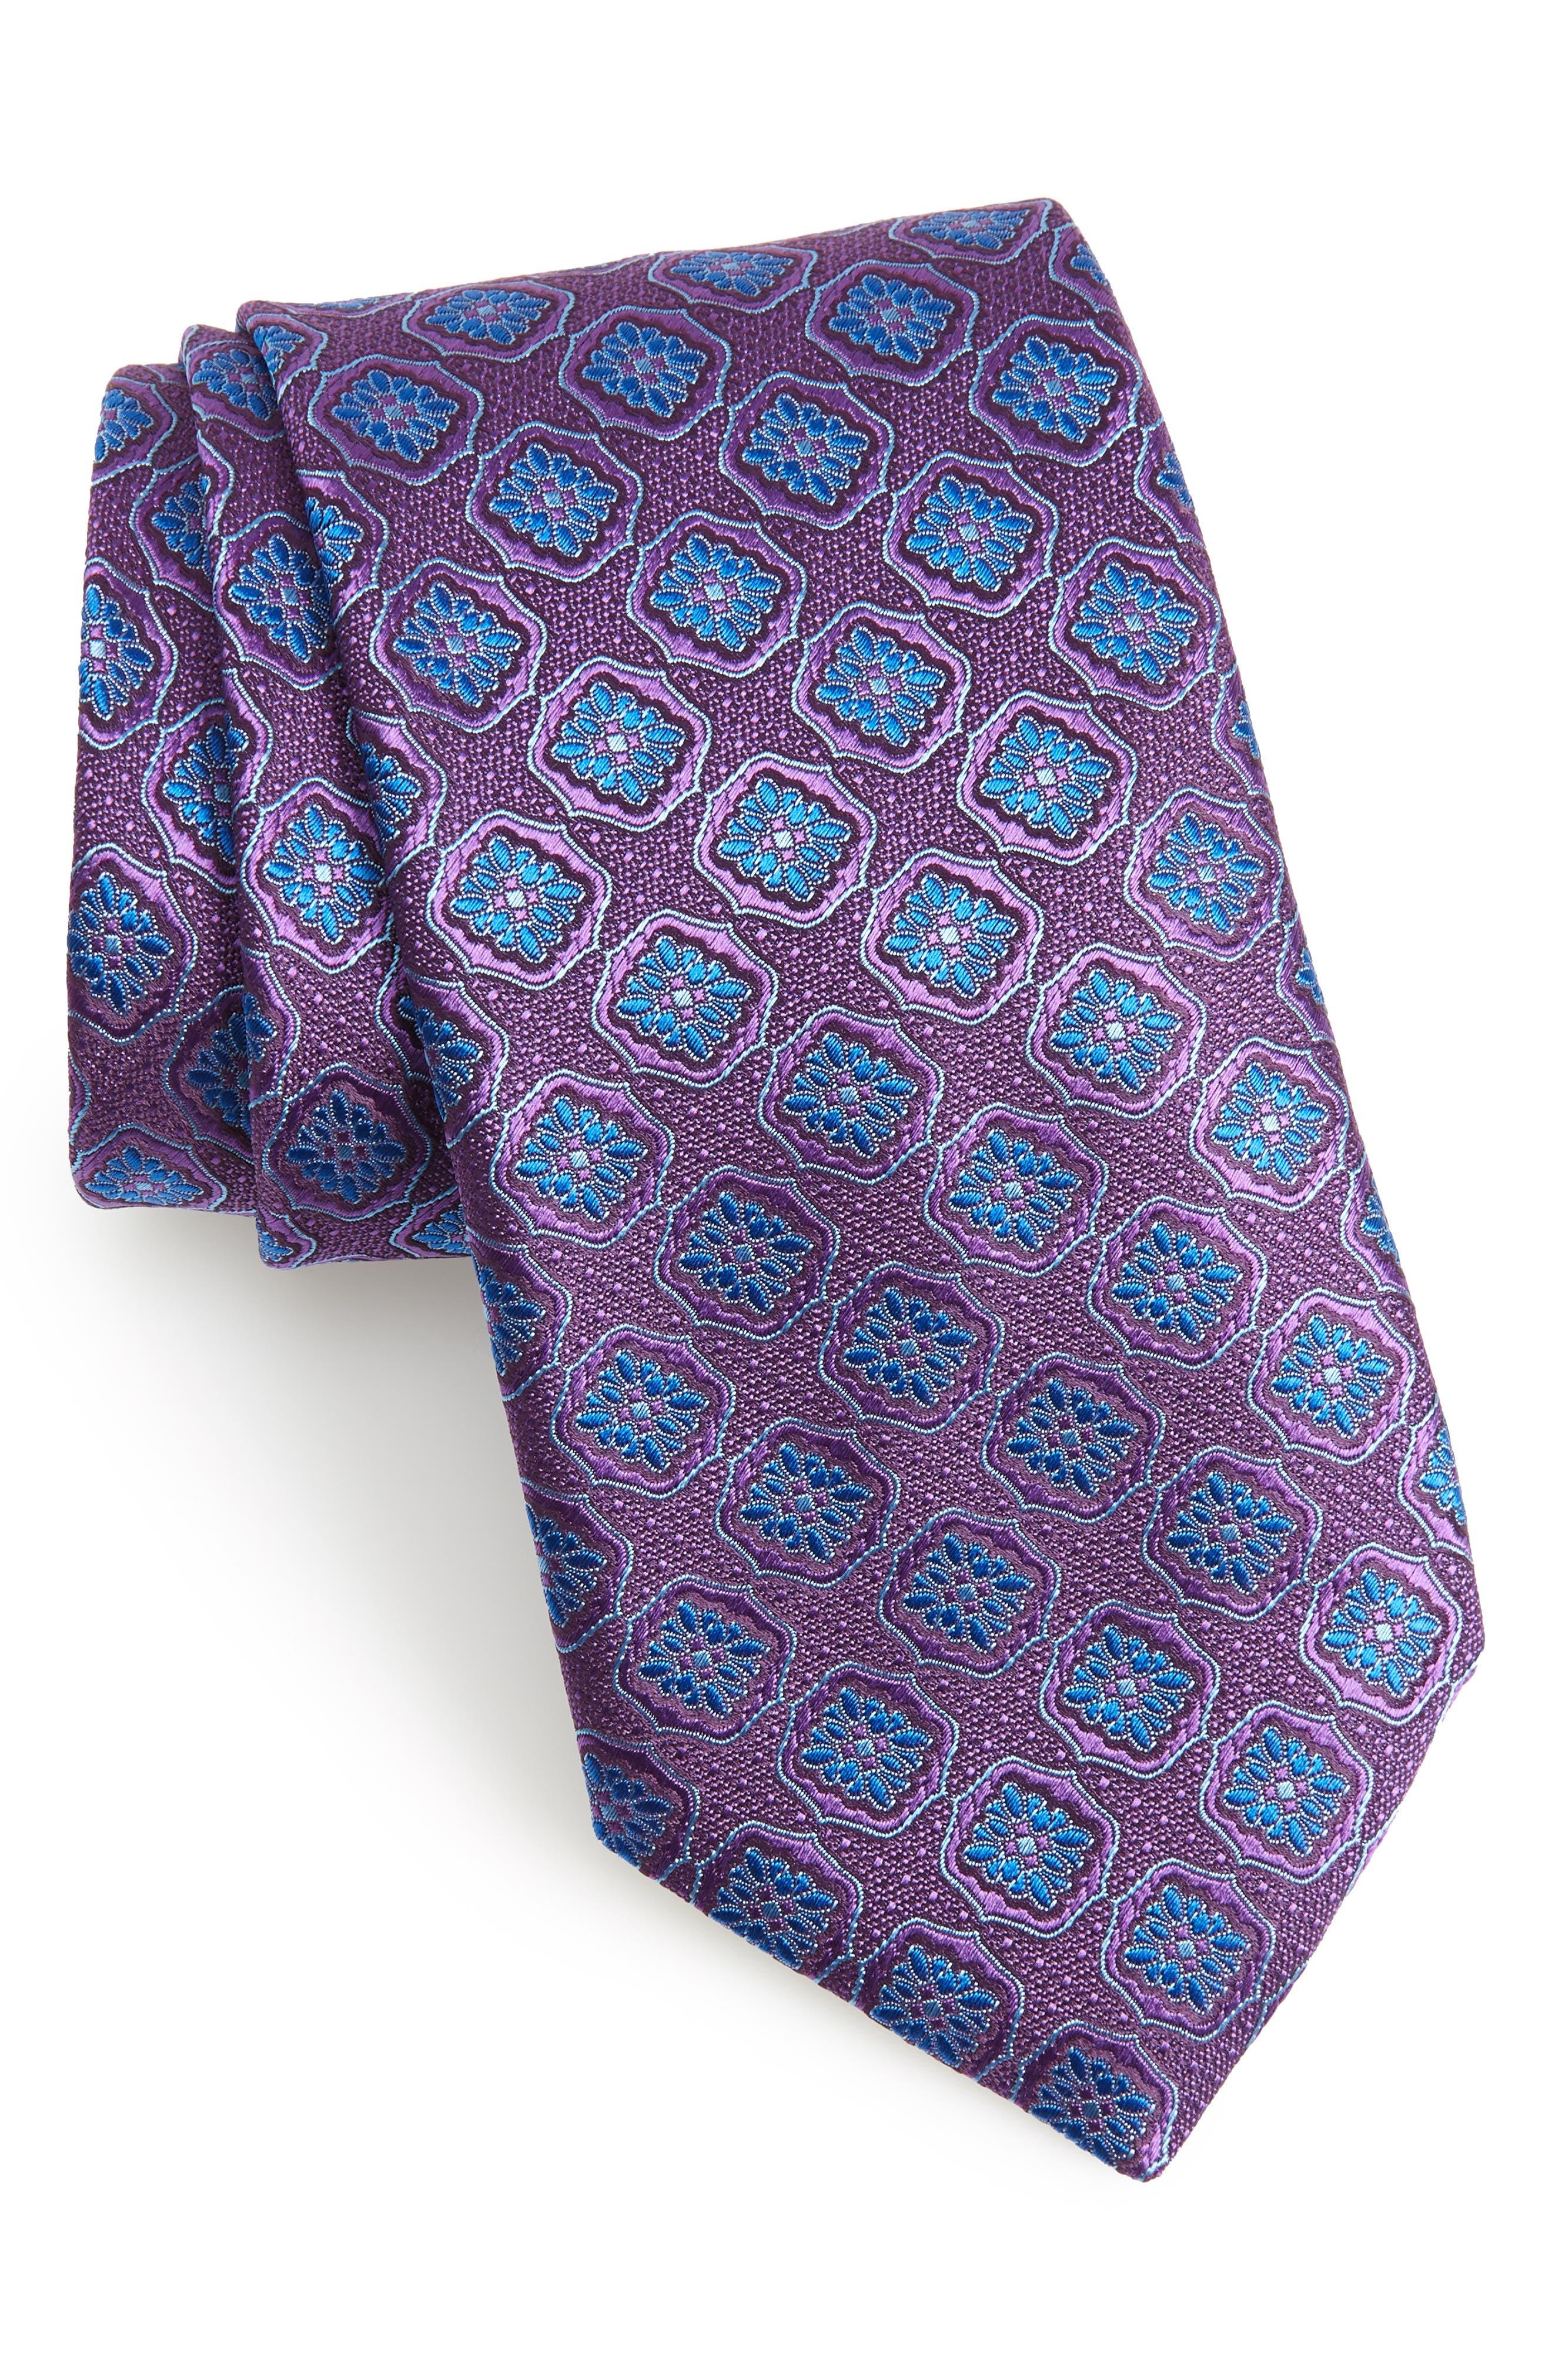 Medallion Silk Tie,                         Main,                         color, PURPLE